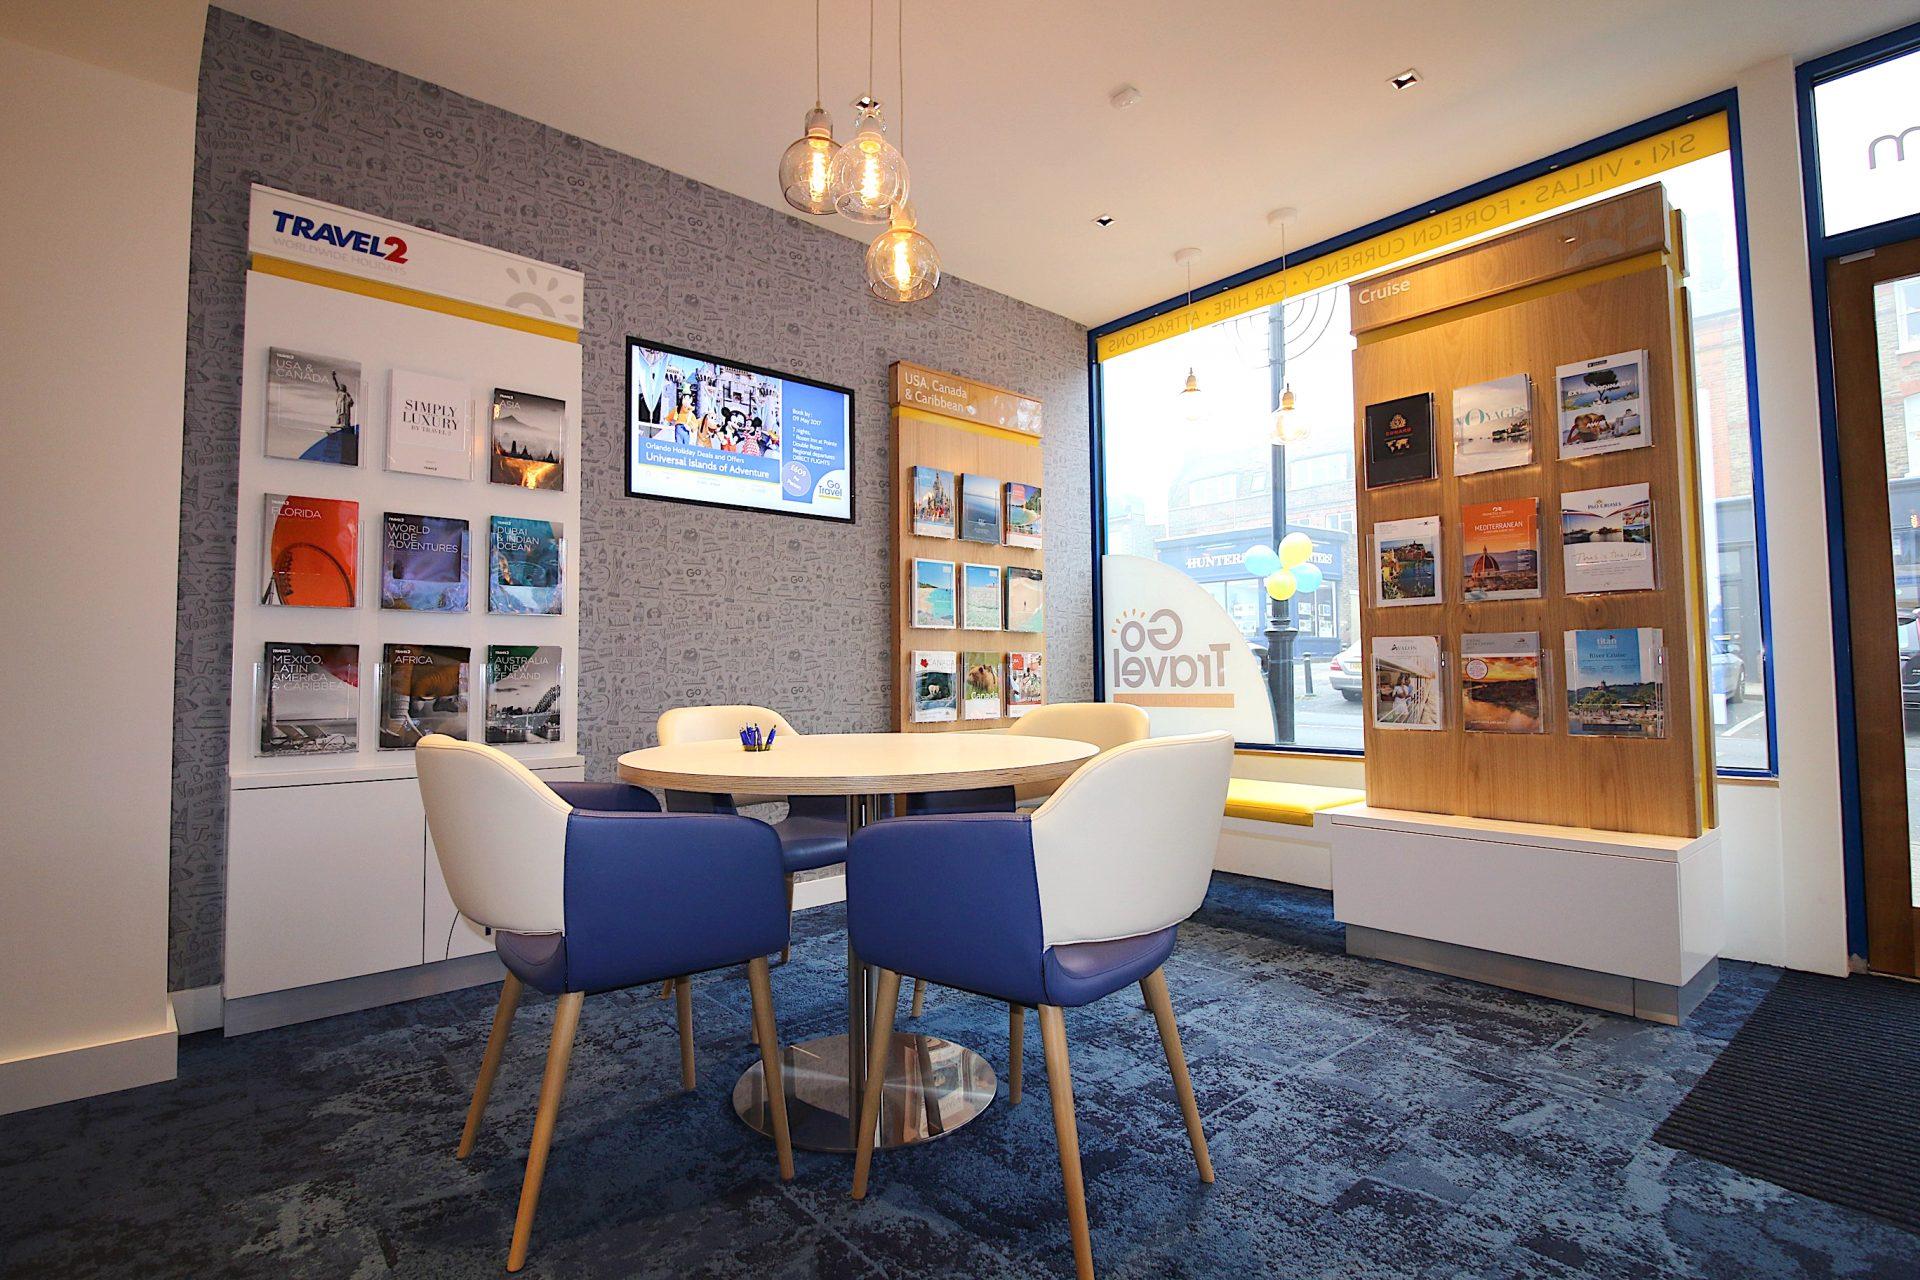 Go Travel_Chislhrust_Interior Design By Nugget Design 05